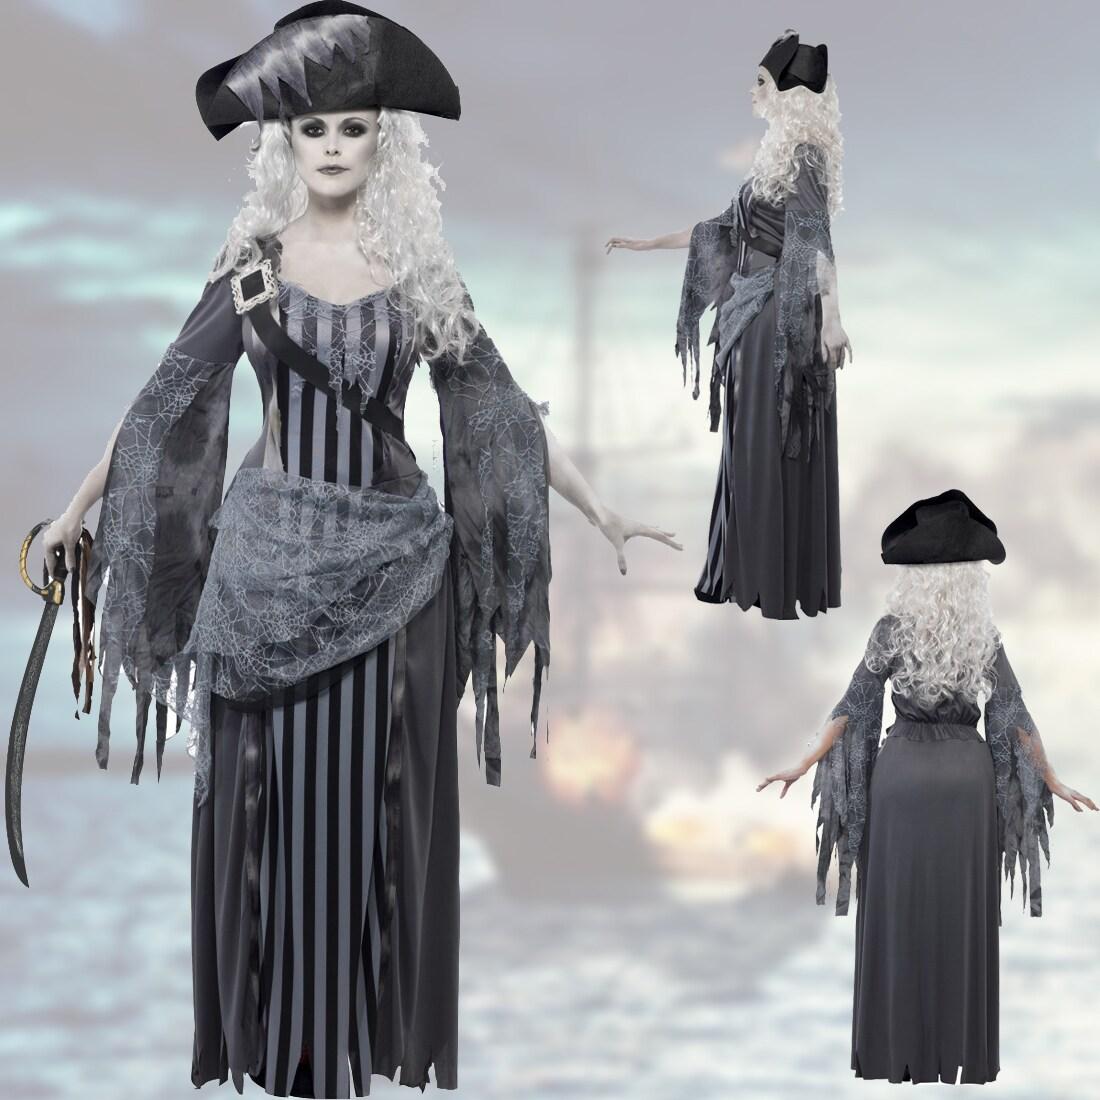 Zombie Geister Piratin Kostüm Damen Zombiekostüm Piratinkostüm Halloween M 40//42